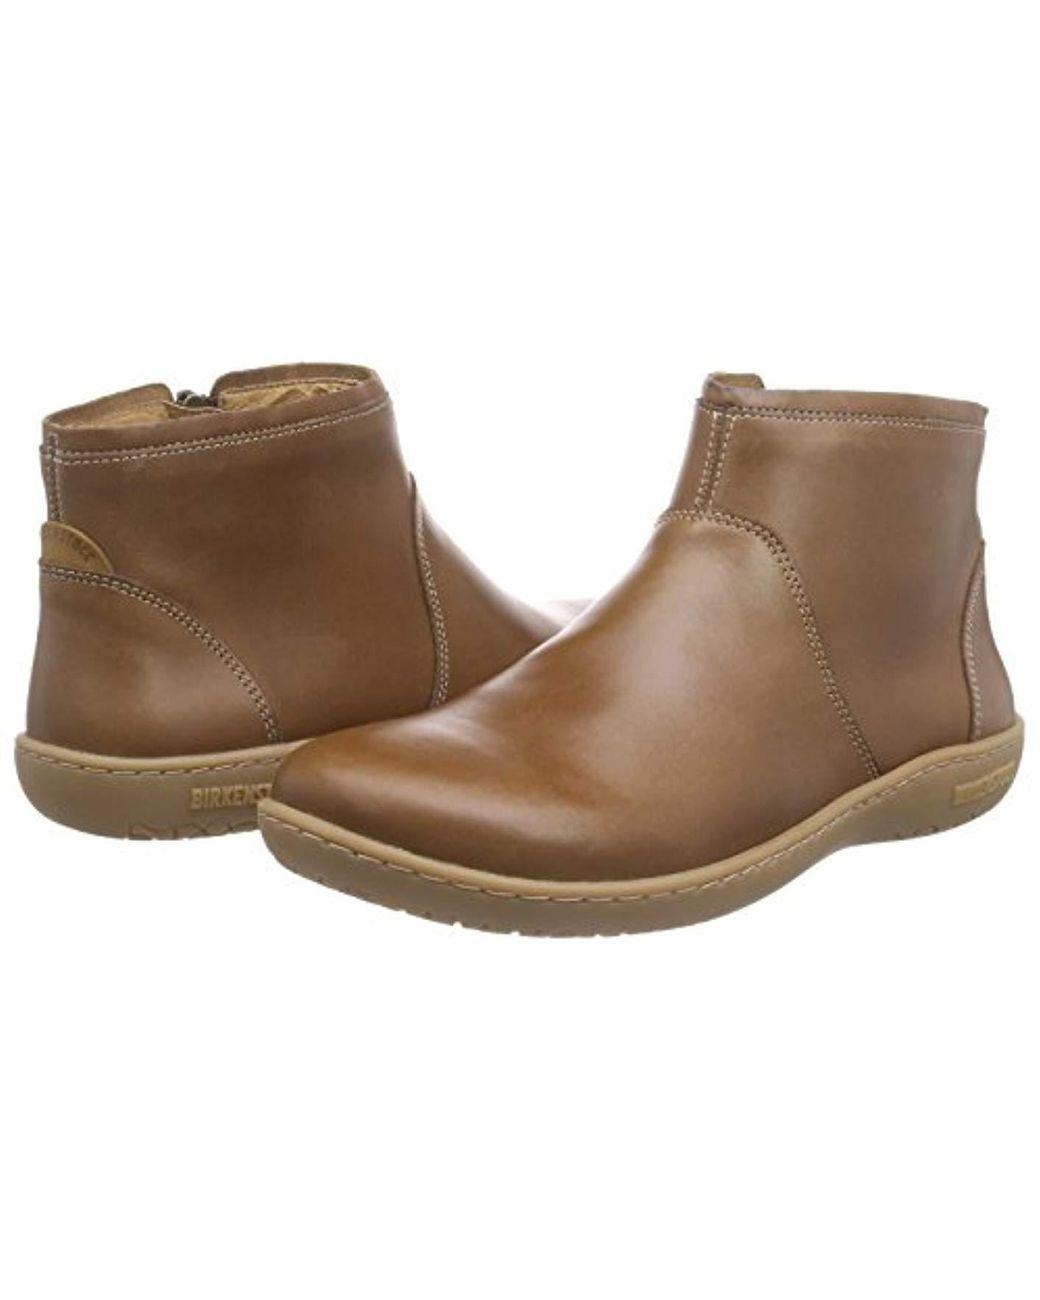 Birkenstock Bennington Damen Ankle Boots in Brown Lyst